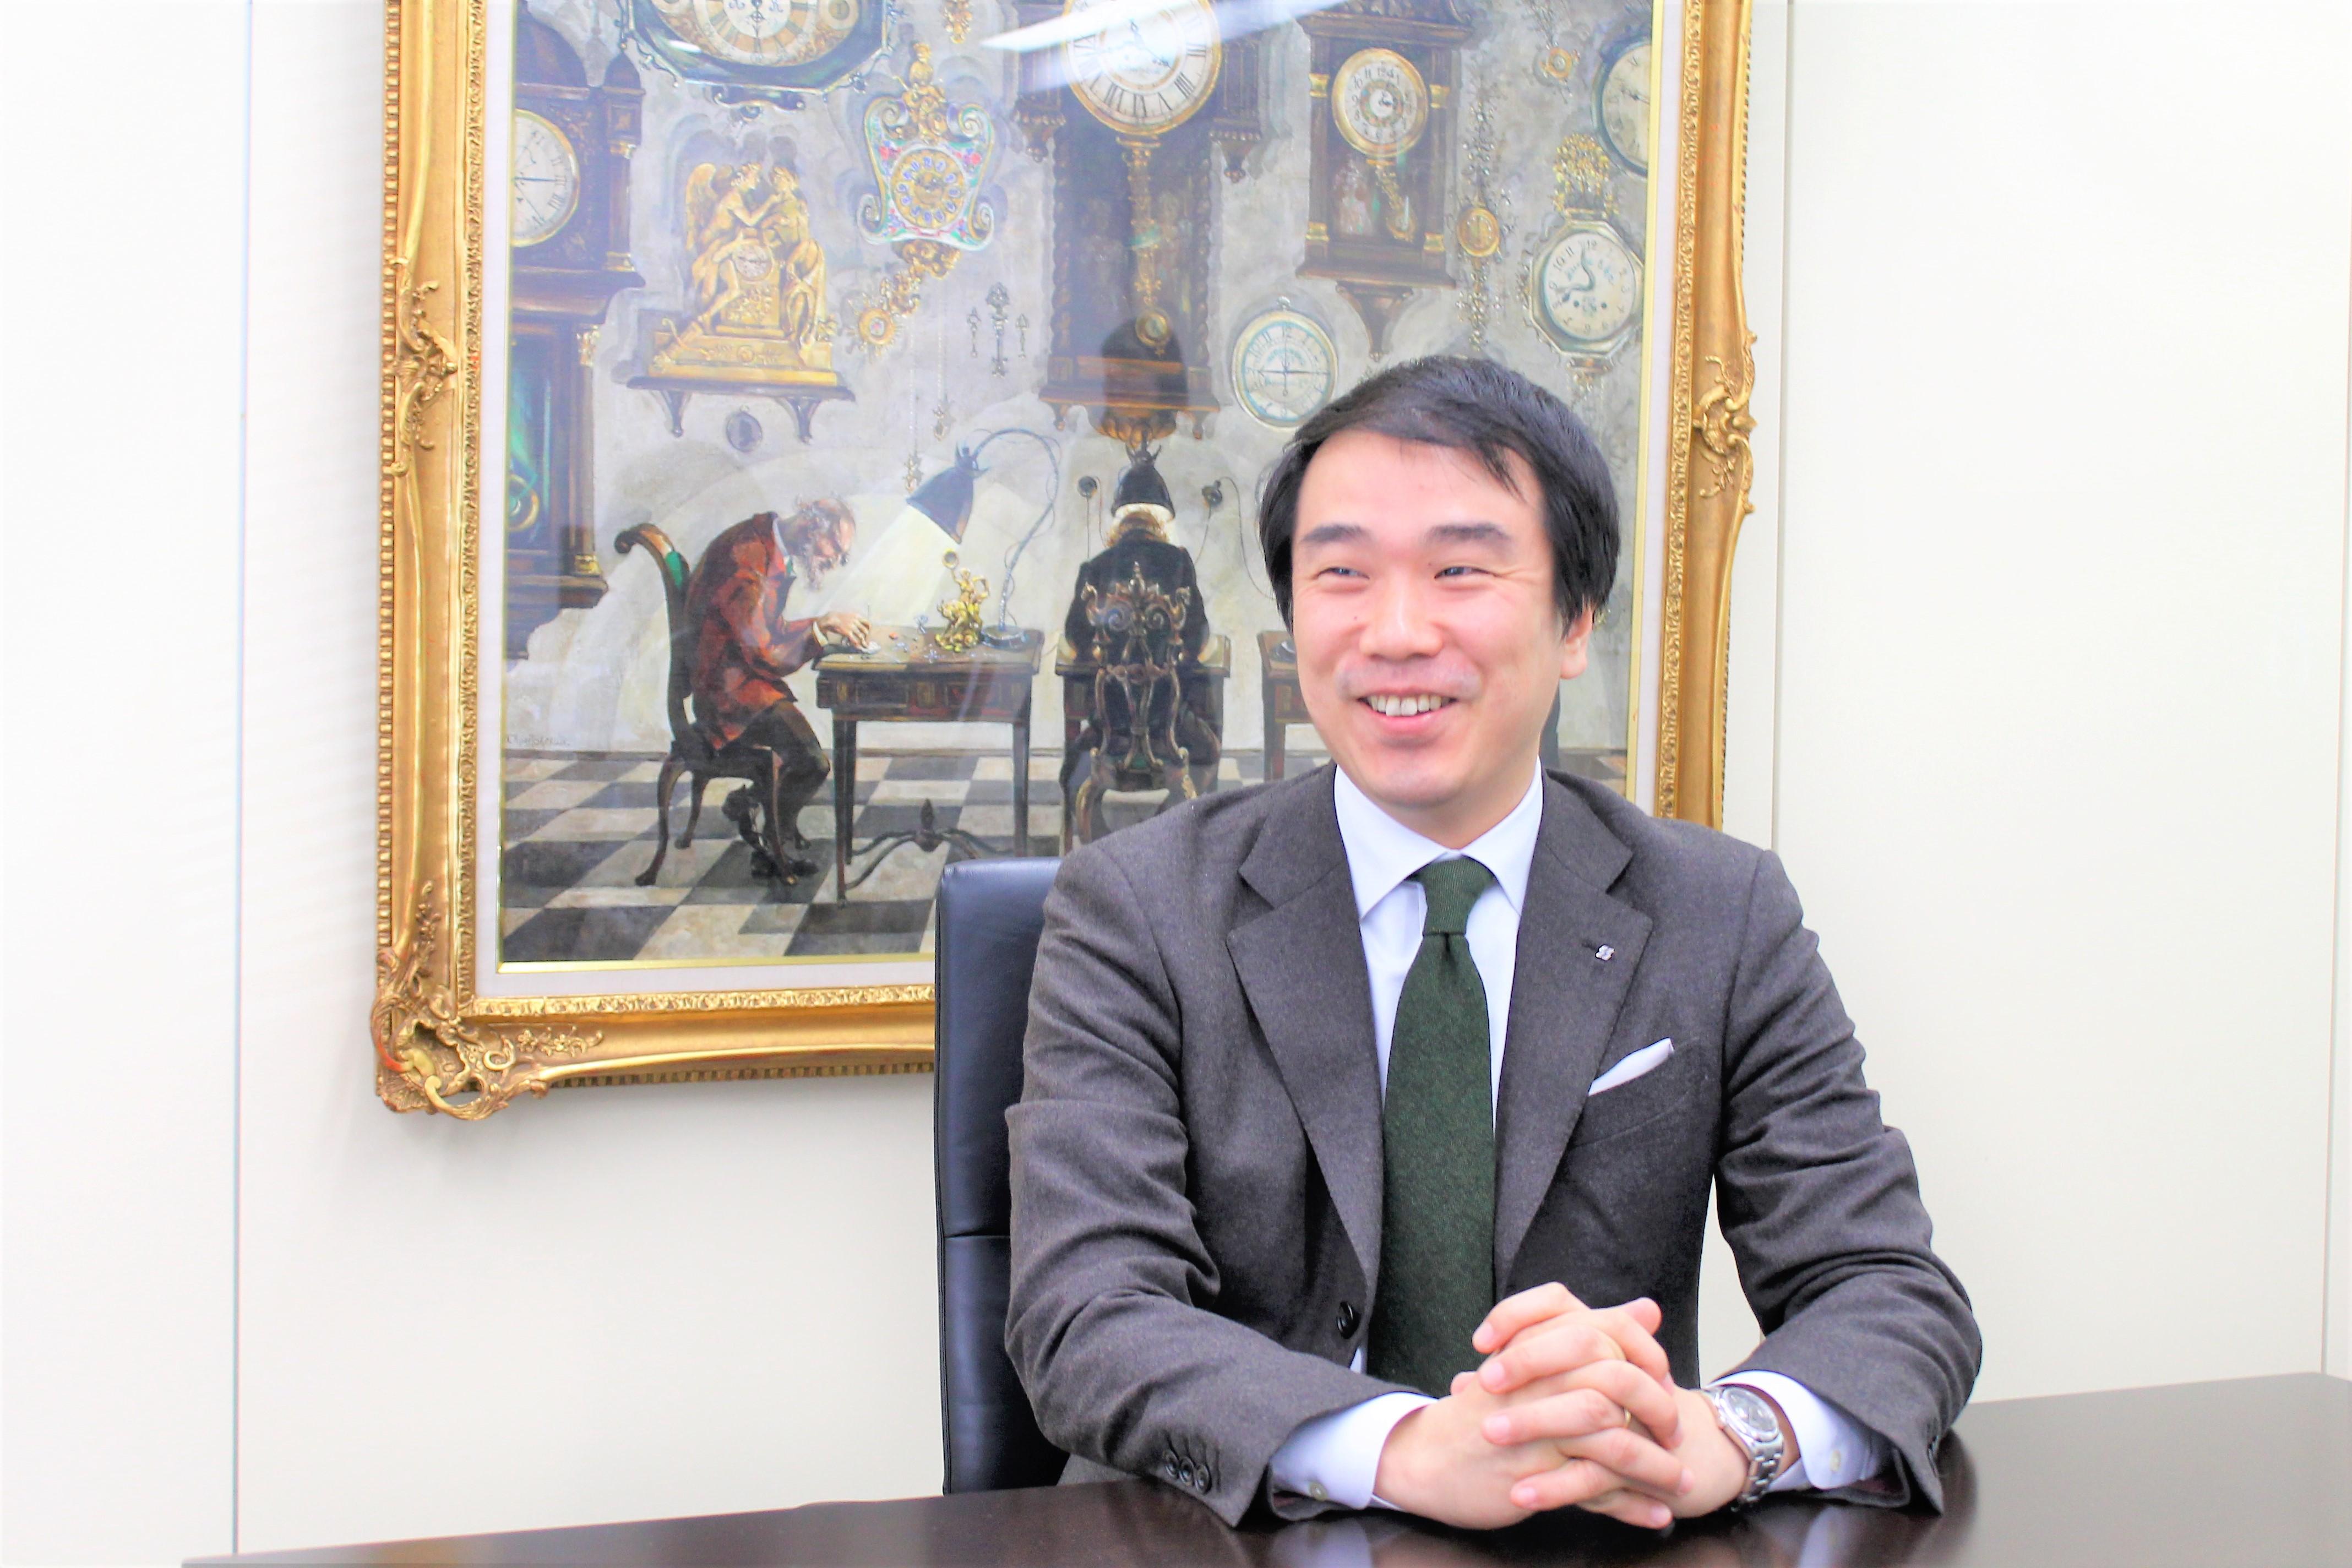 株式会社ホッタ取締役社長の堀田様